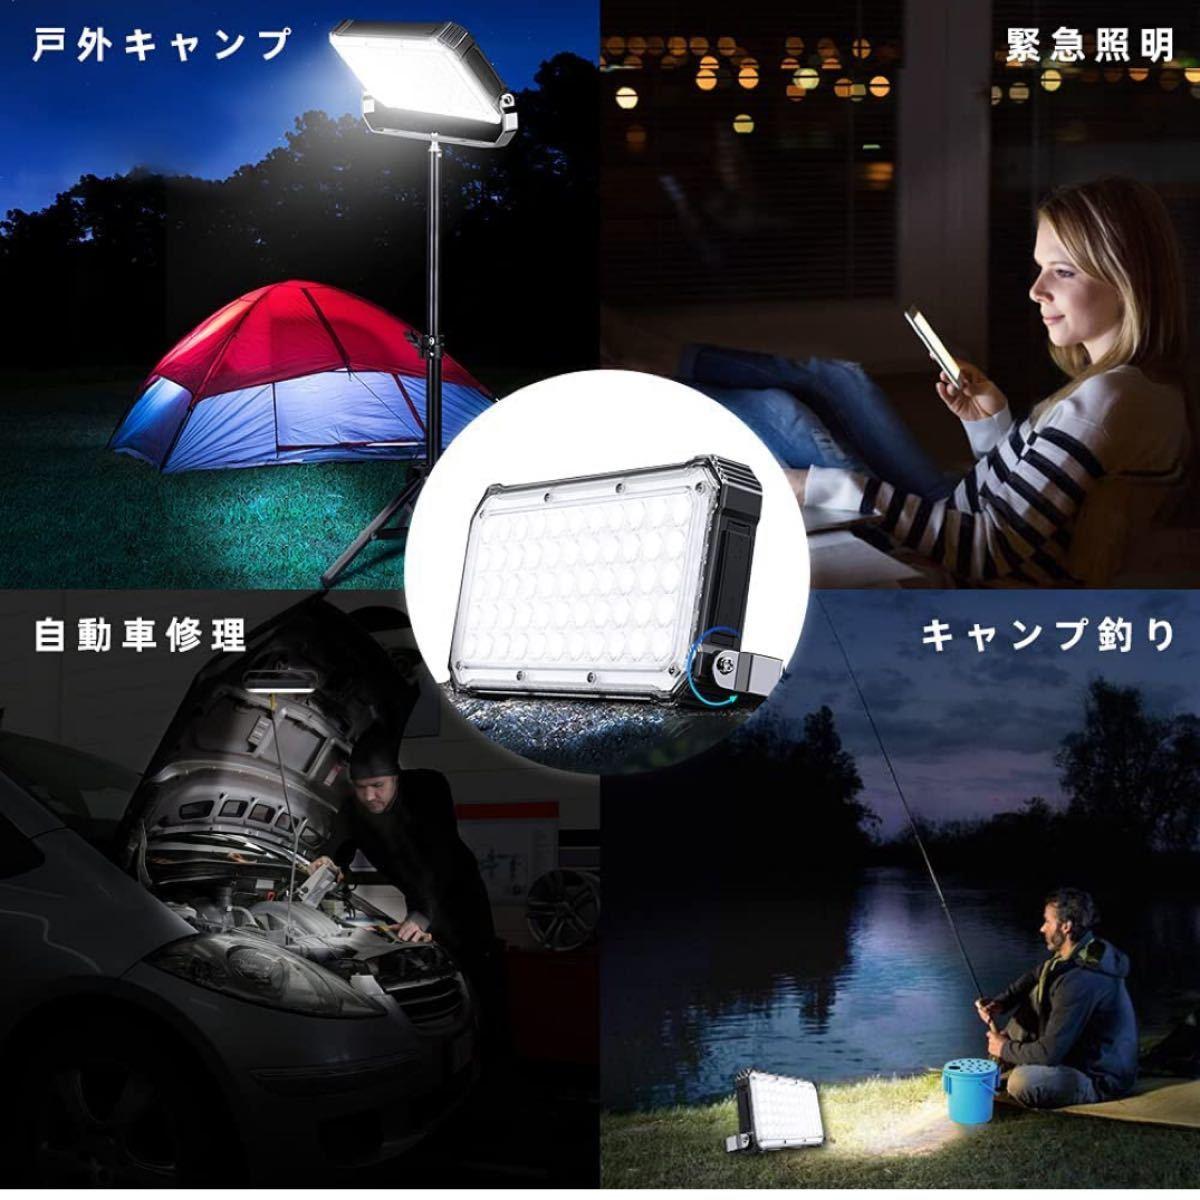 LED ランタン キャンプライトUSB充電式 キャンプランタン 20000mAh LED ライト懐中電灯 キャンプ用品 照明器具